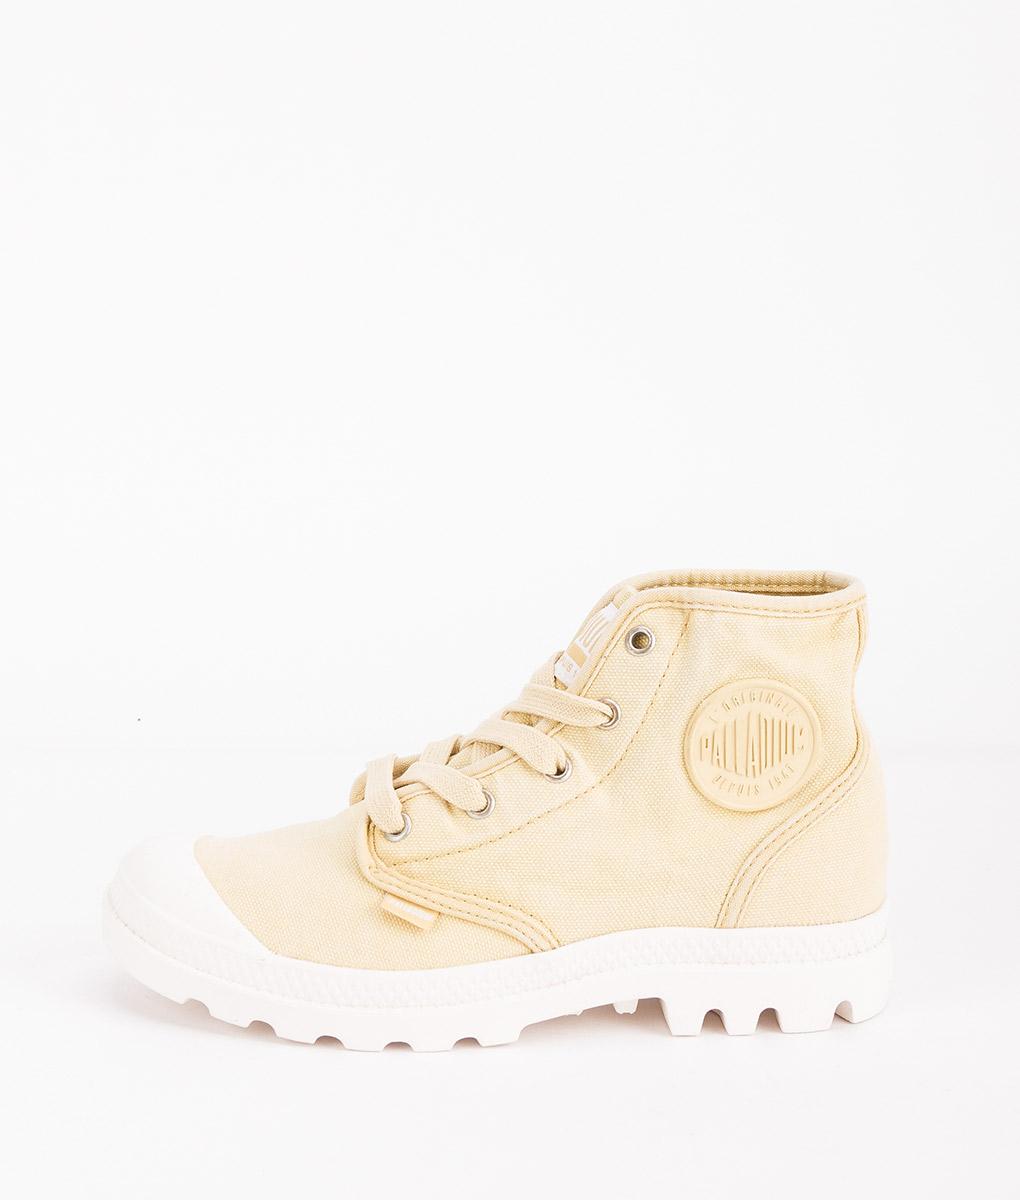 PALLADIUM Women Sneakers 92352 PAMPA HI, Pampas Ecru 74.99